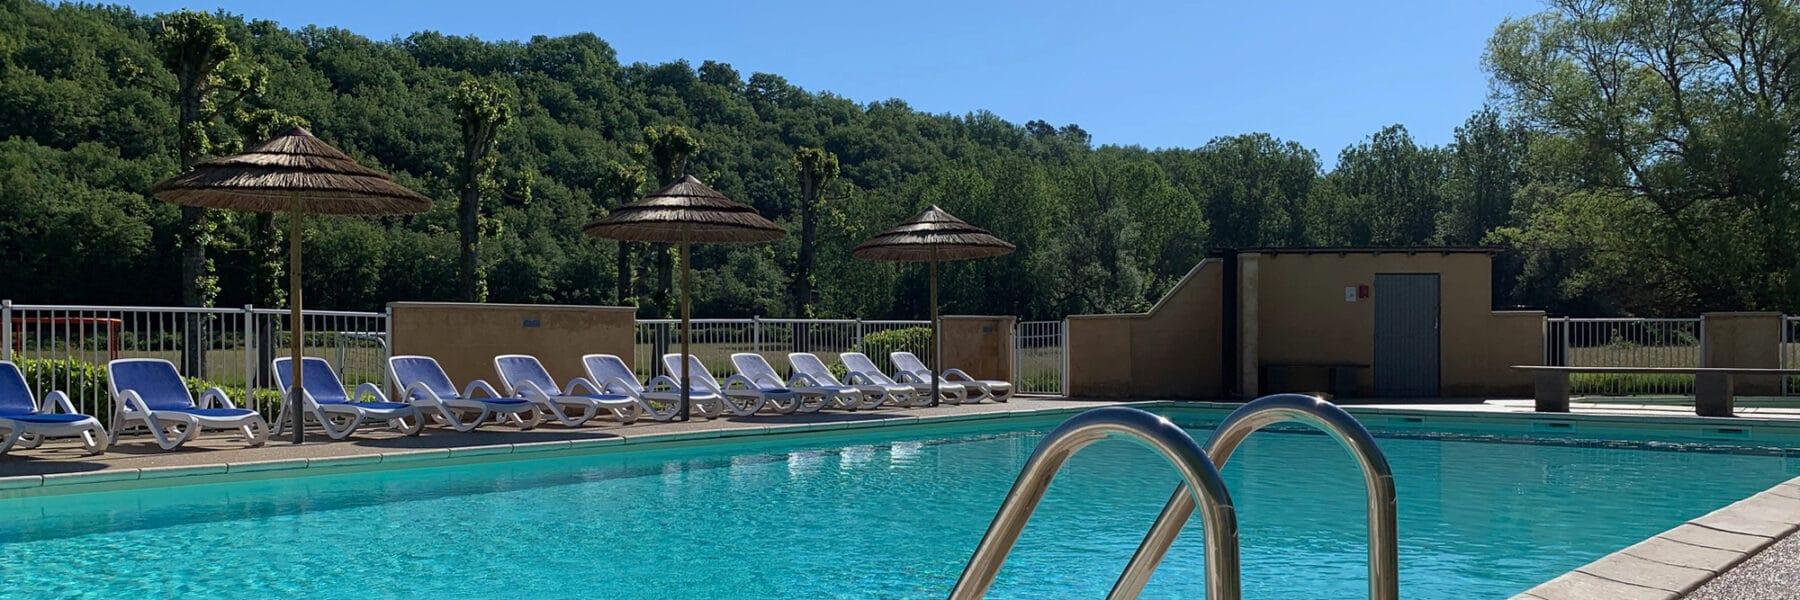 La piscine chauffée du camping en Périgord